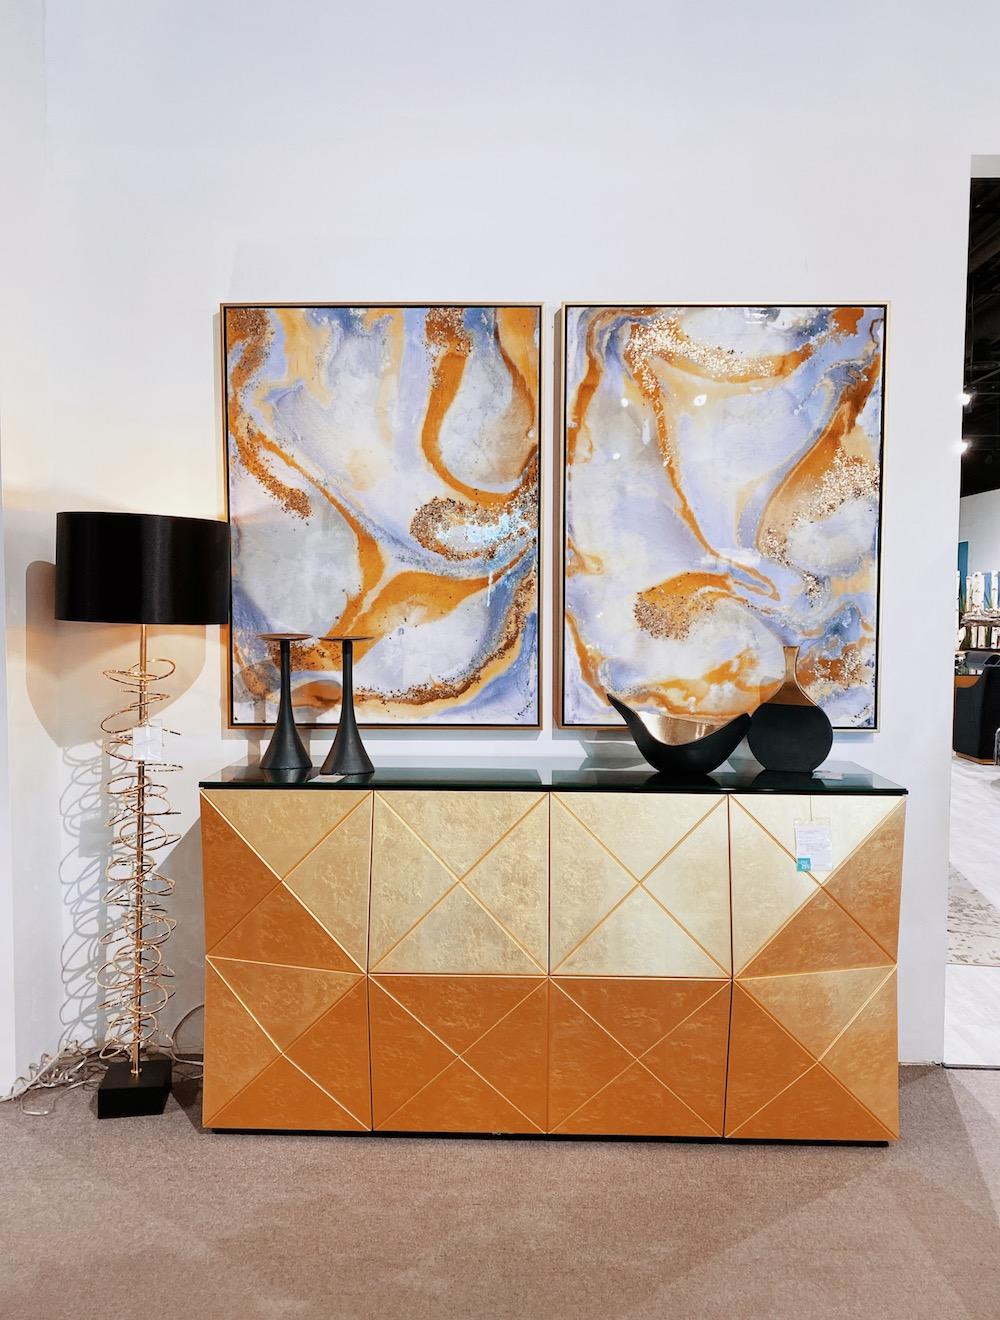 martin daniel interiors wall art Toronto home decor 5